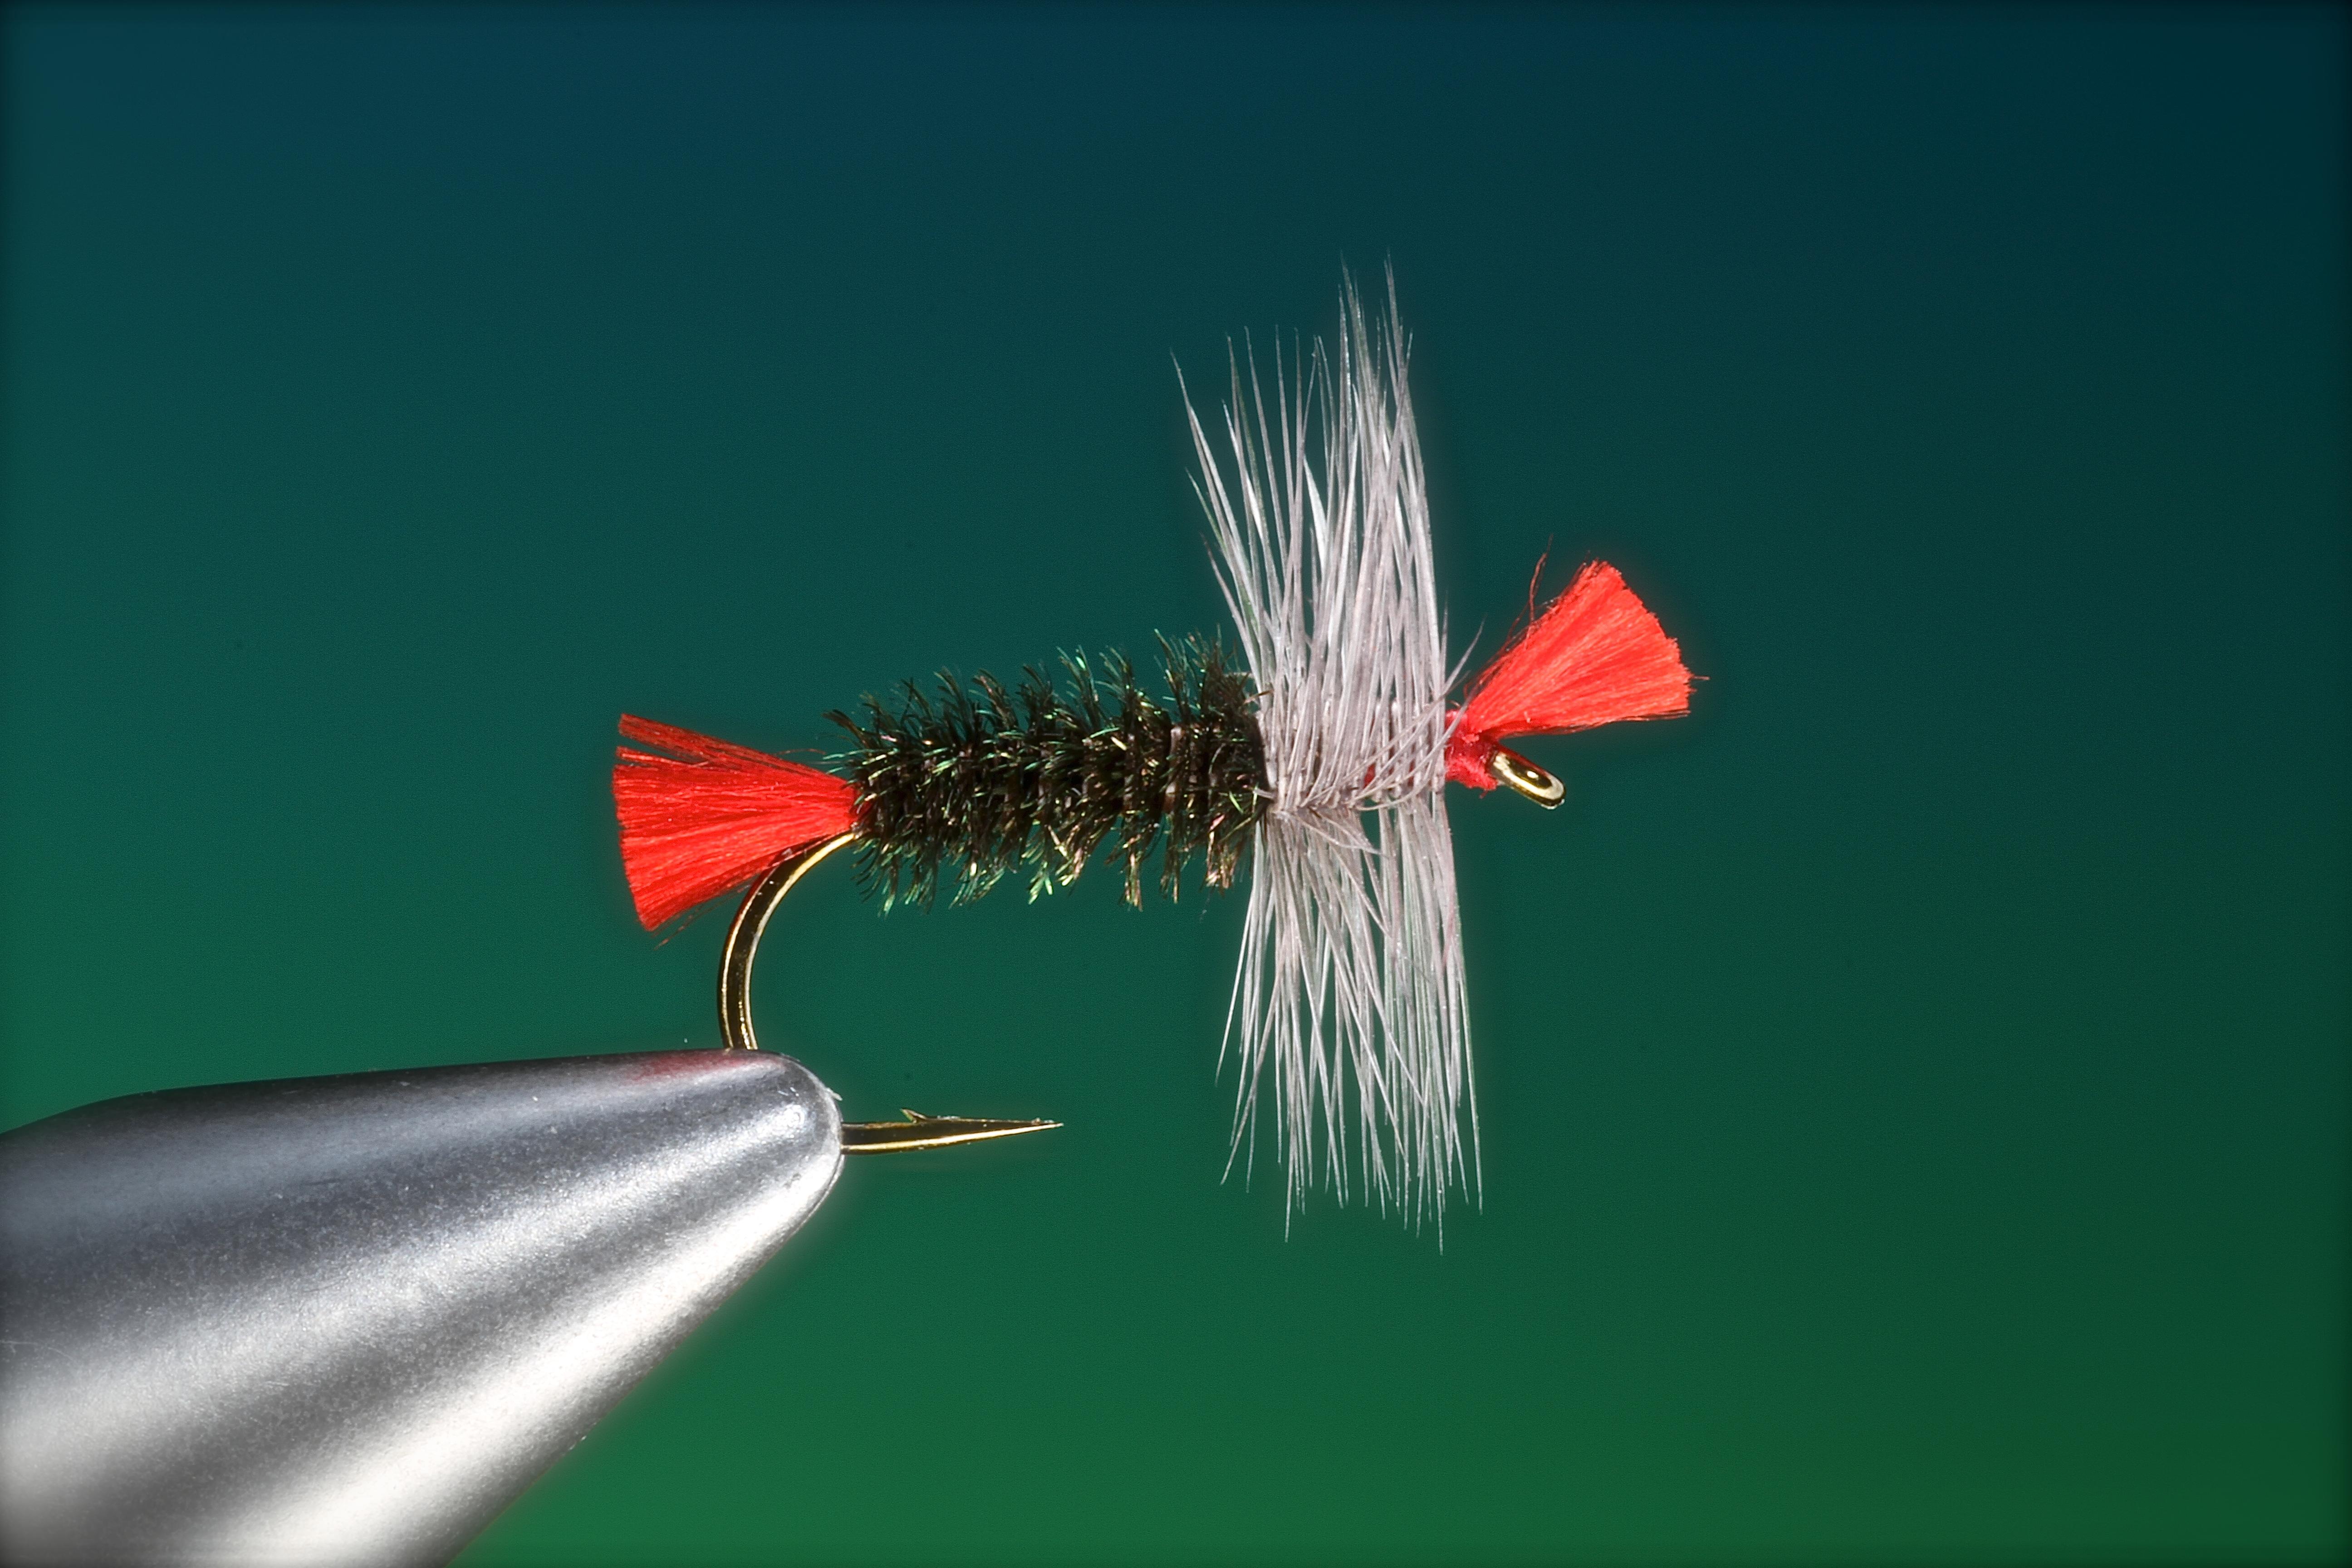 grayling flies